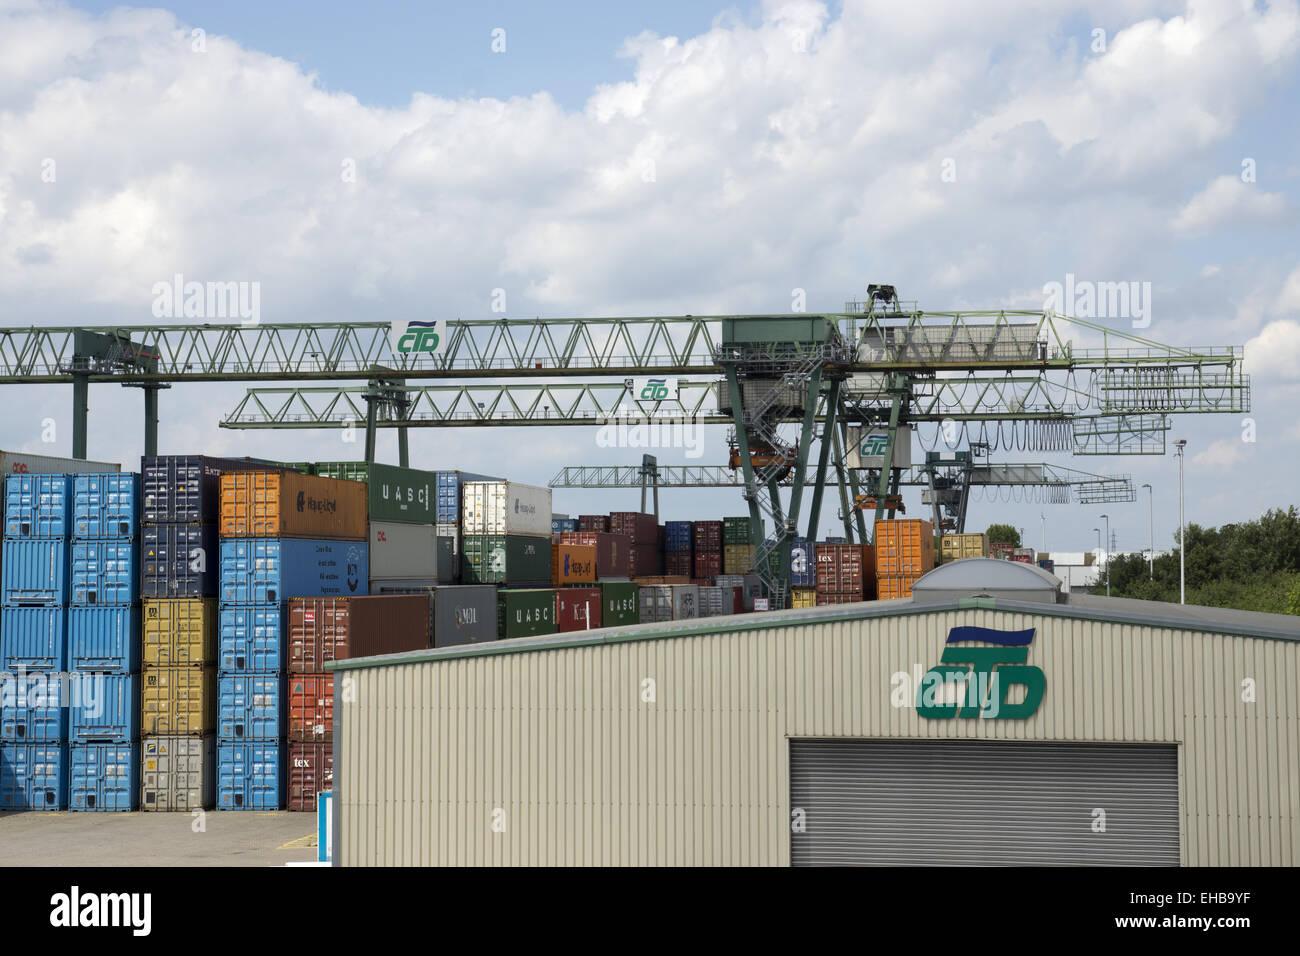 Container harbor Dortmund, Germany Stock Photo